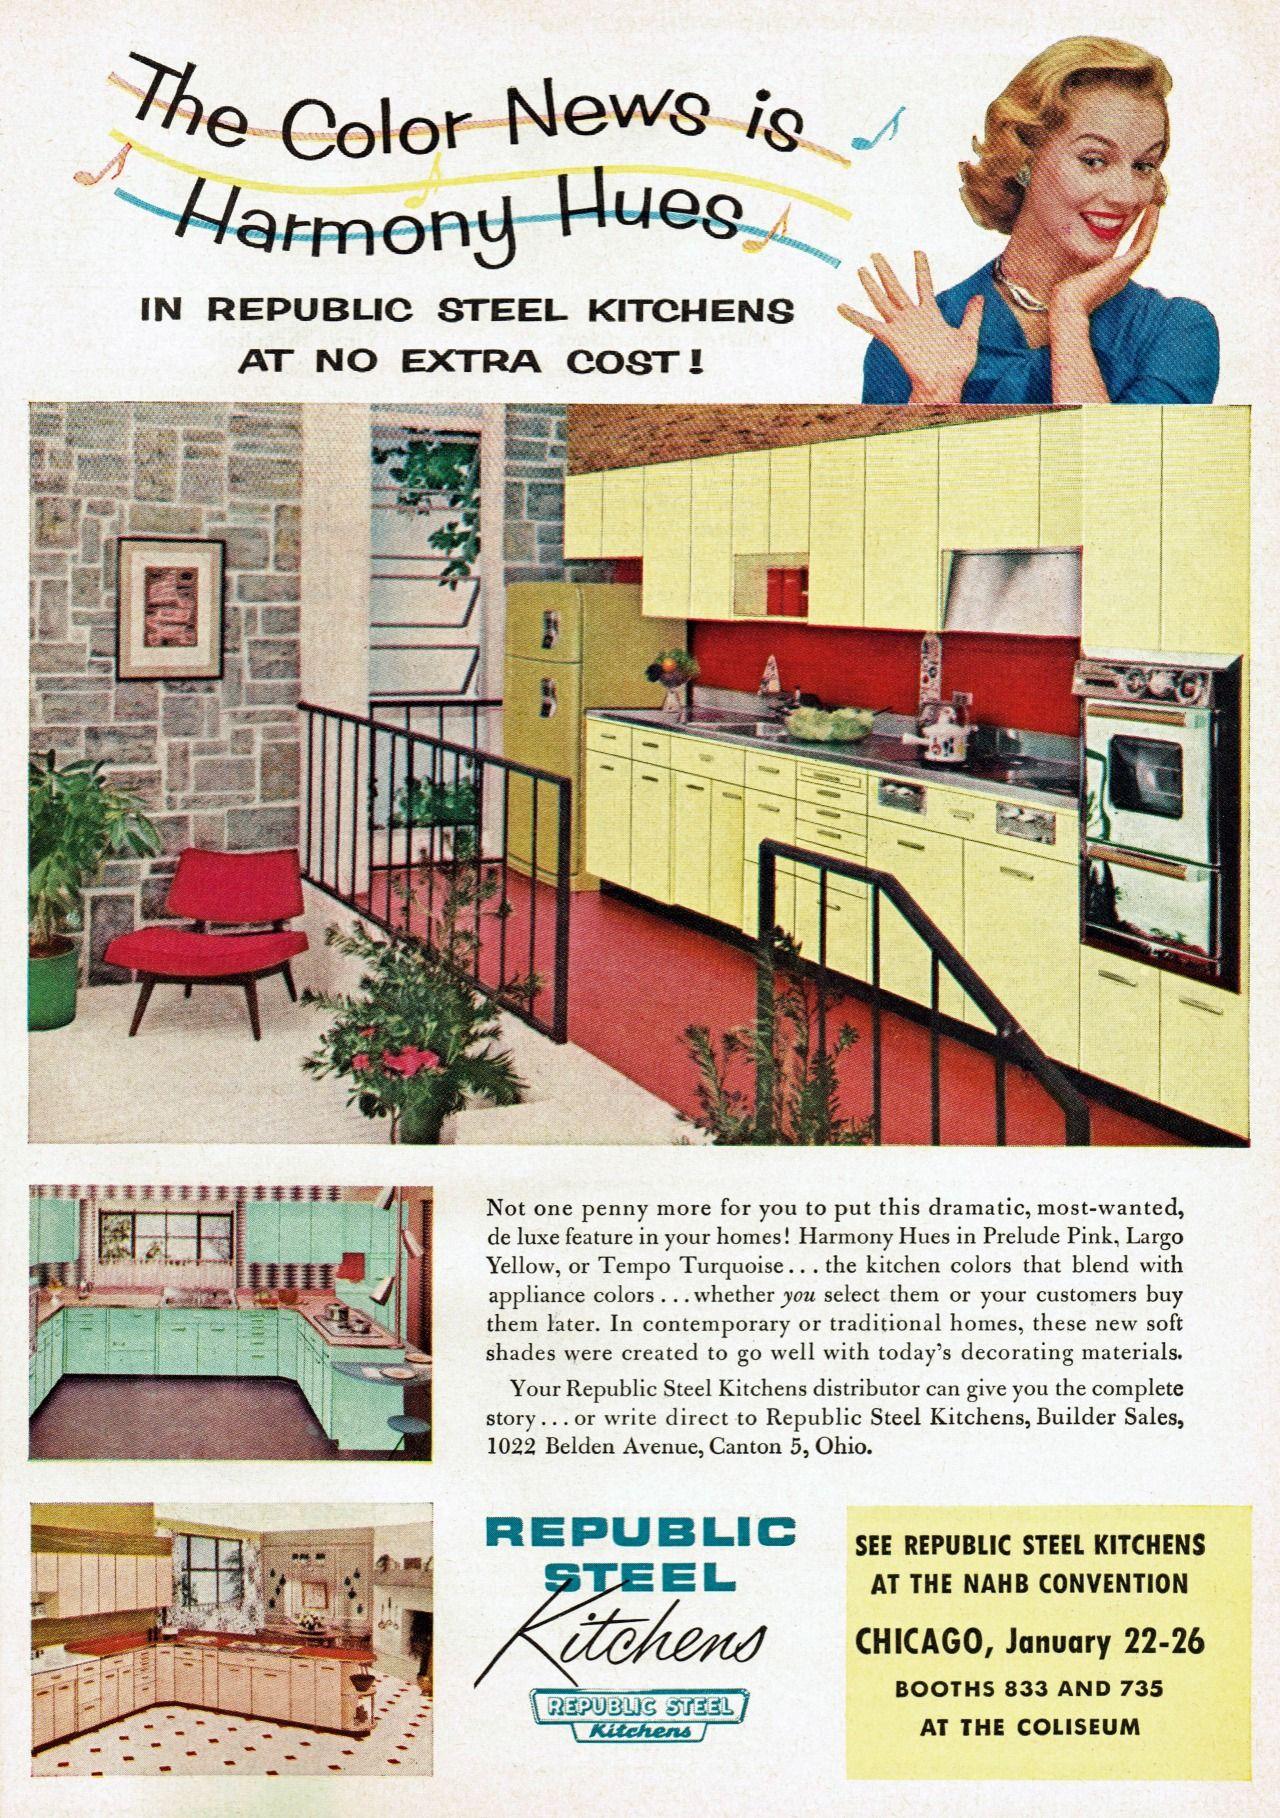 Republic Steel Kitchens Ad 1956 Love The Top Kitchen With The Split Level Retro Decor Vintage Appliances Vintage House